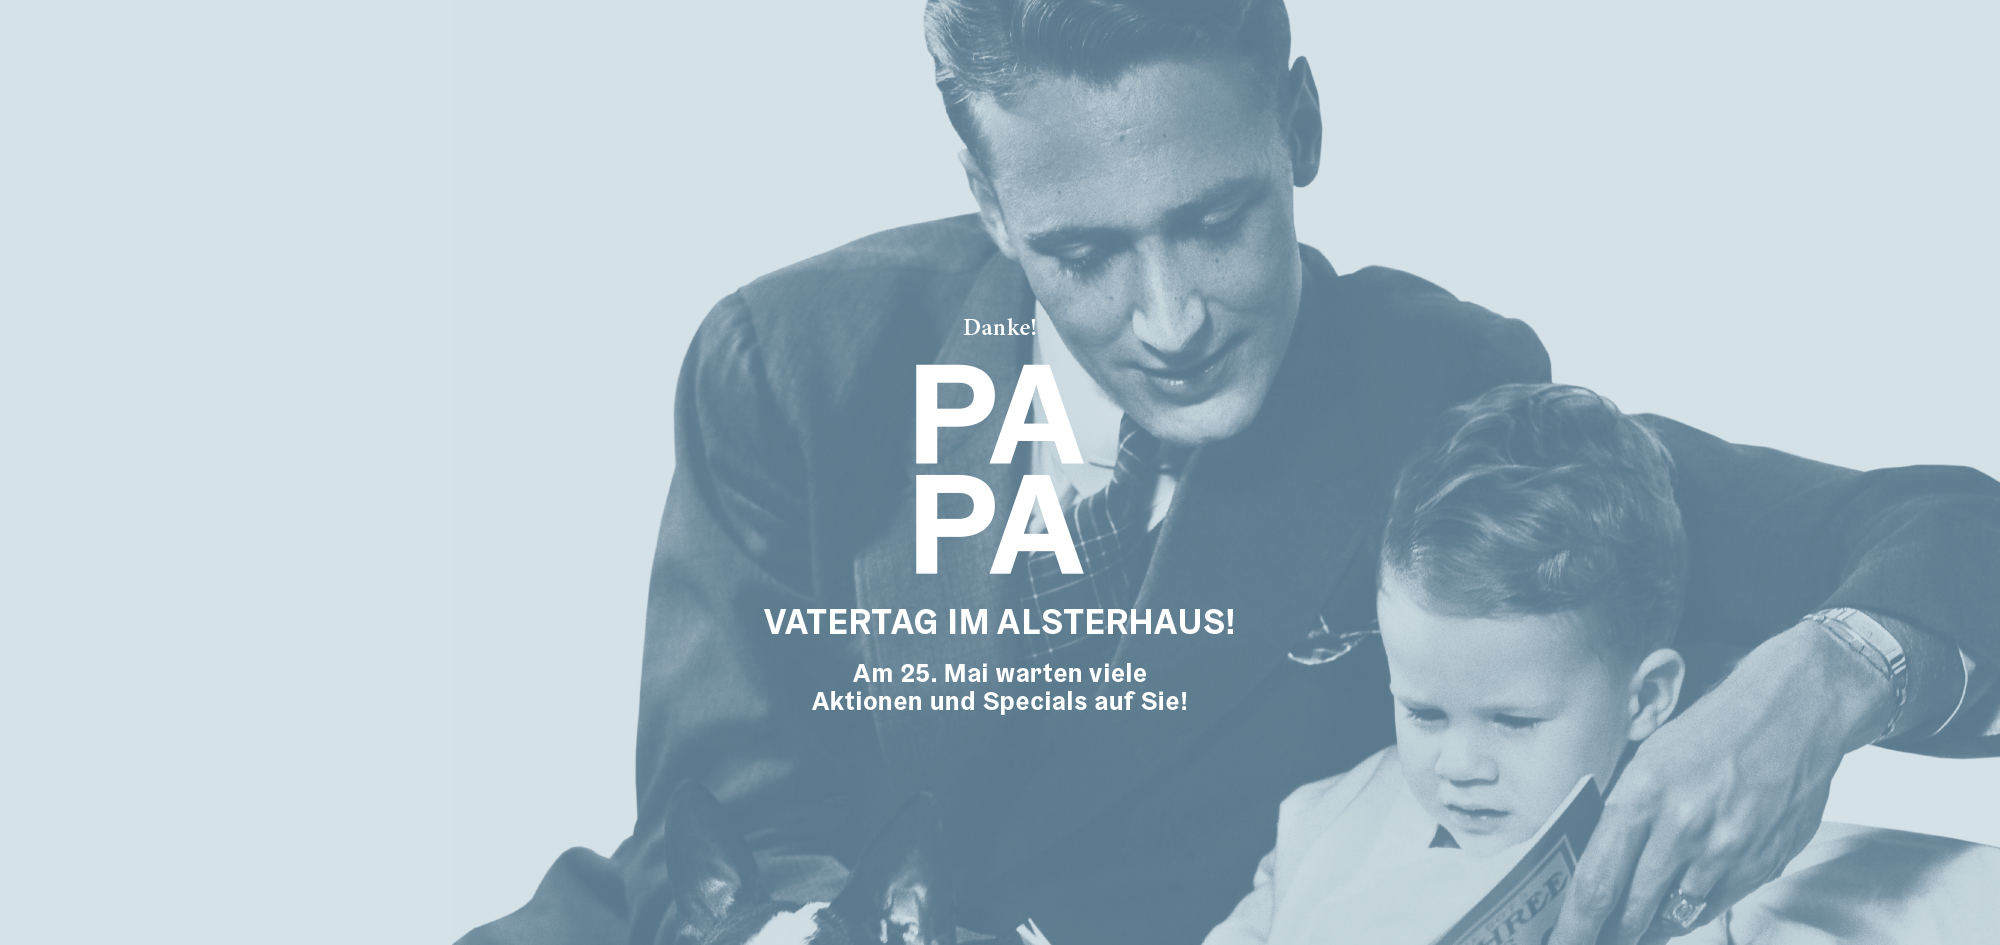 Vatertag-im-Alsterhaus-Aktion-Specials